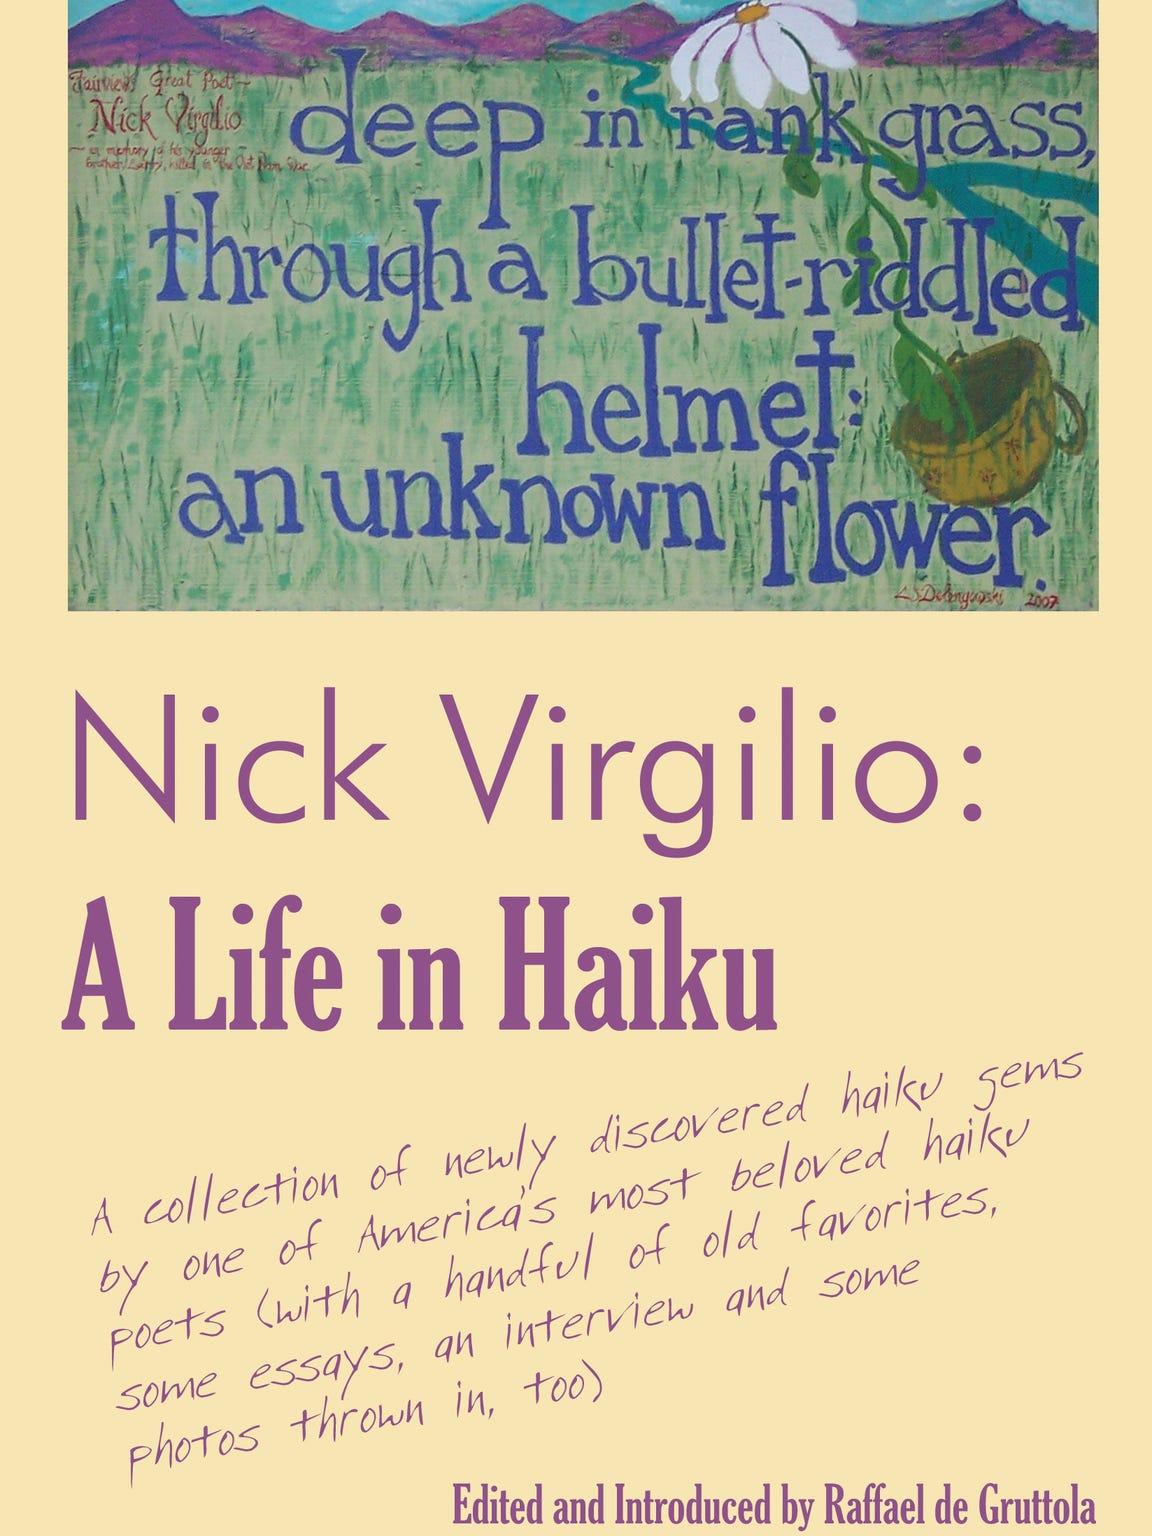 'Nick Virgilio: A Life in Haiku' celebrates the American